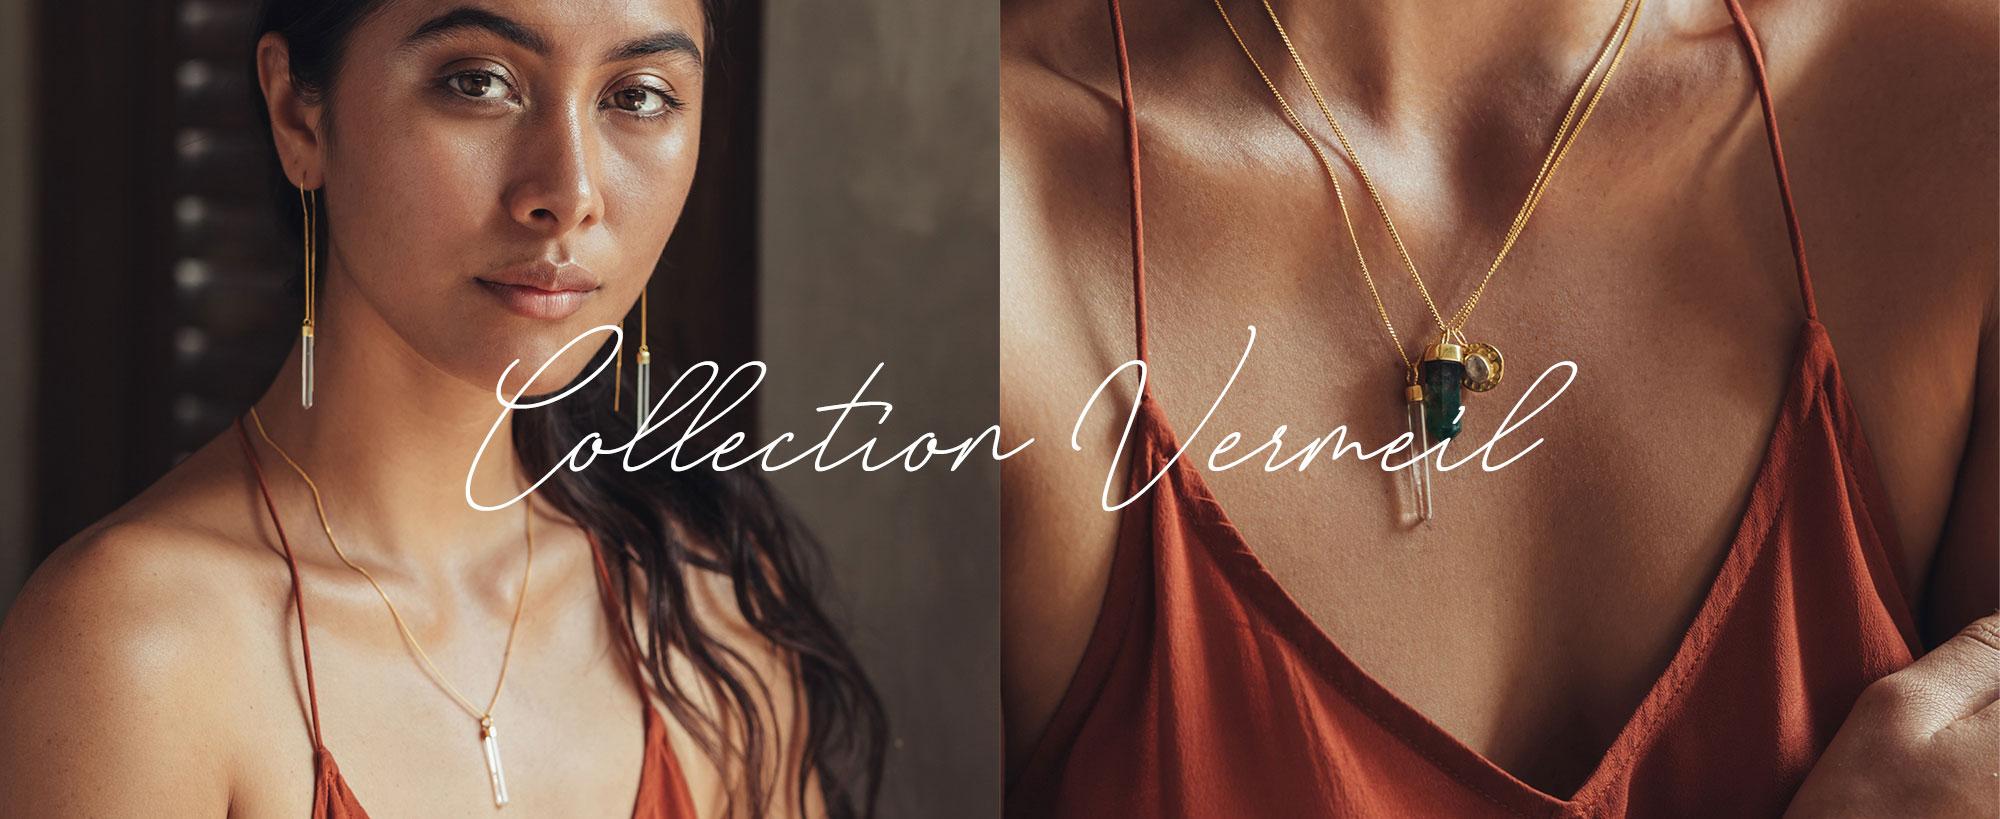 collection-vermeil-slid